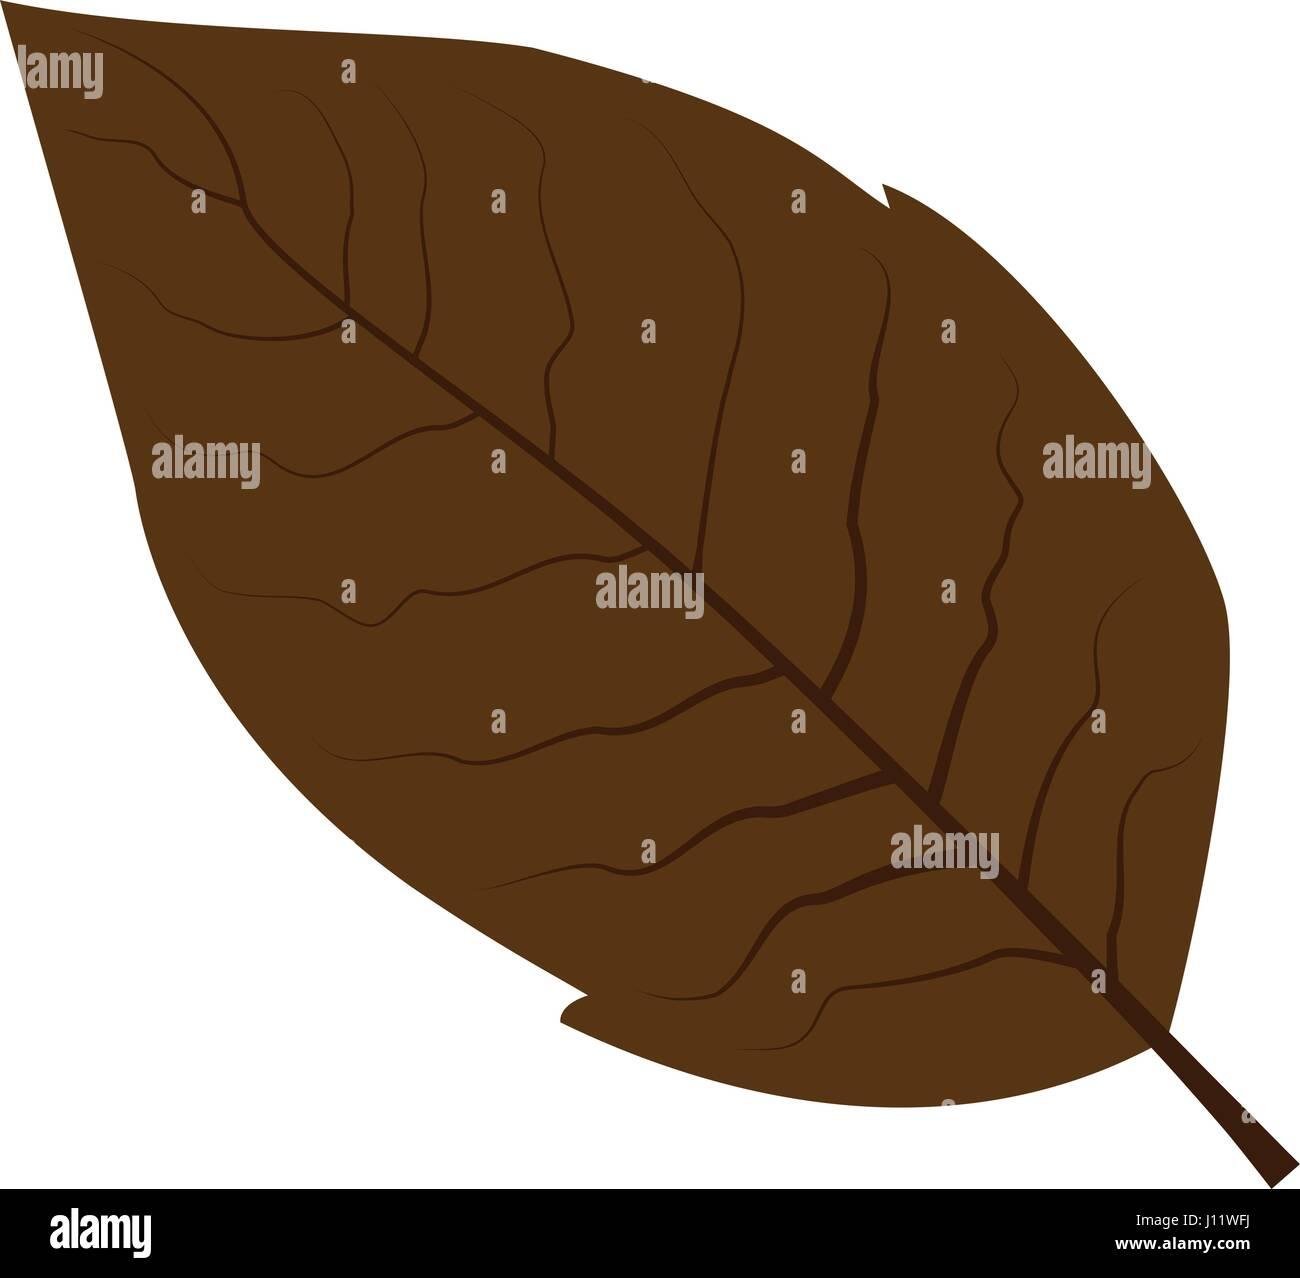 tobacco leaf vector illustration - Stock Vector